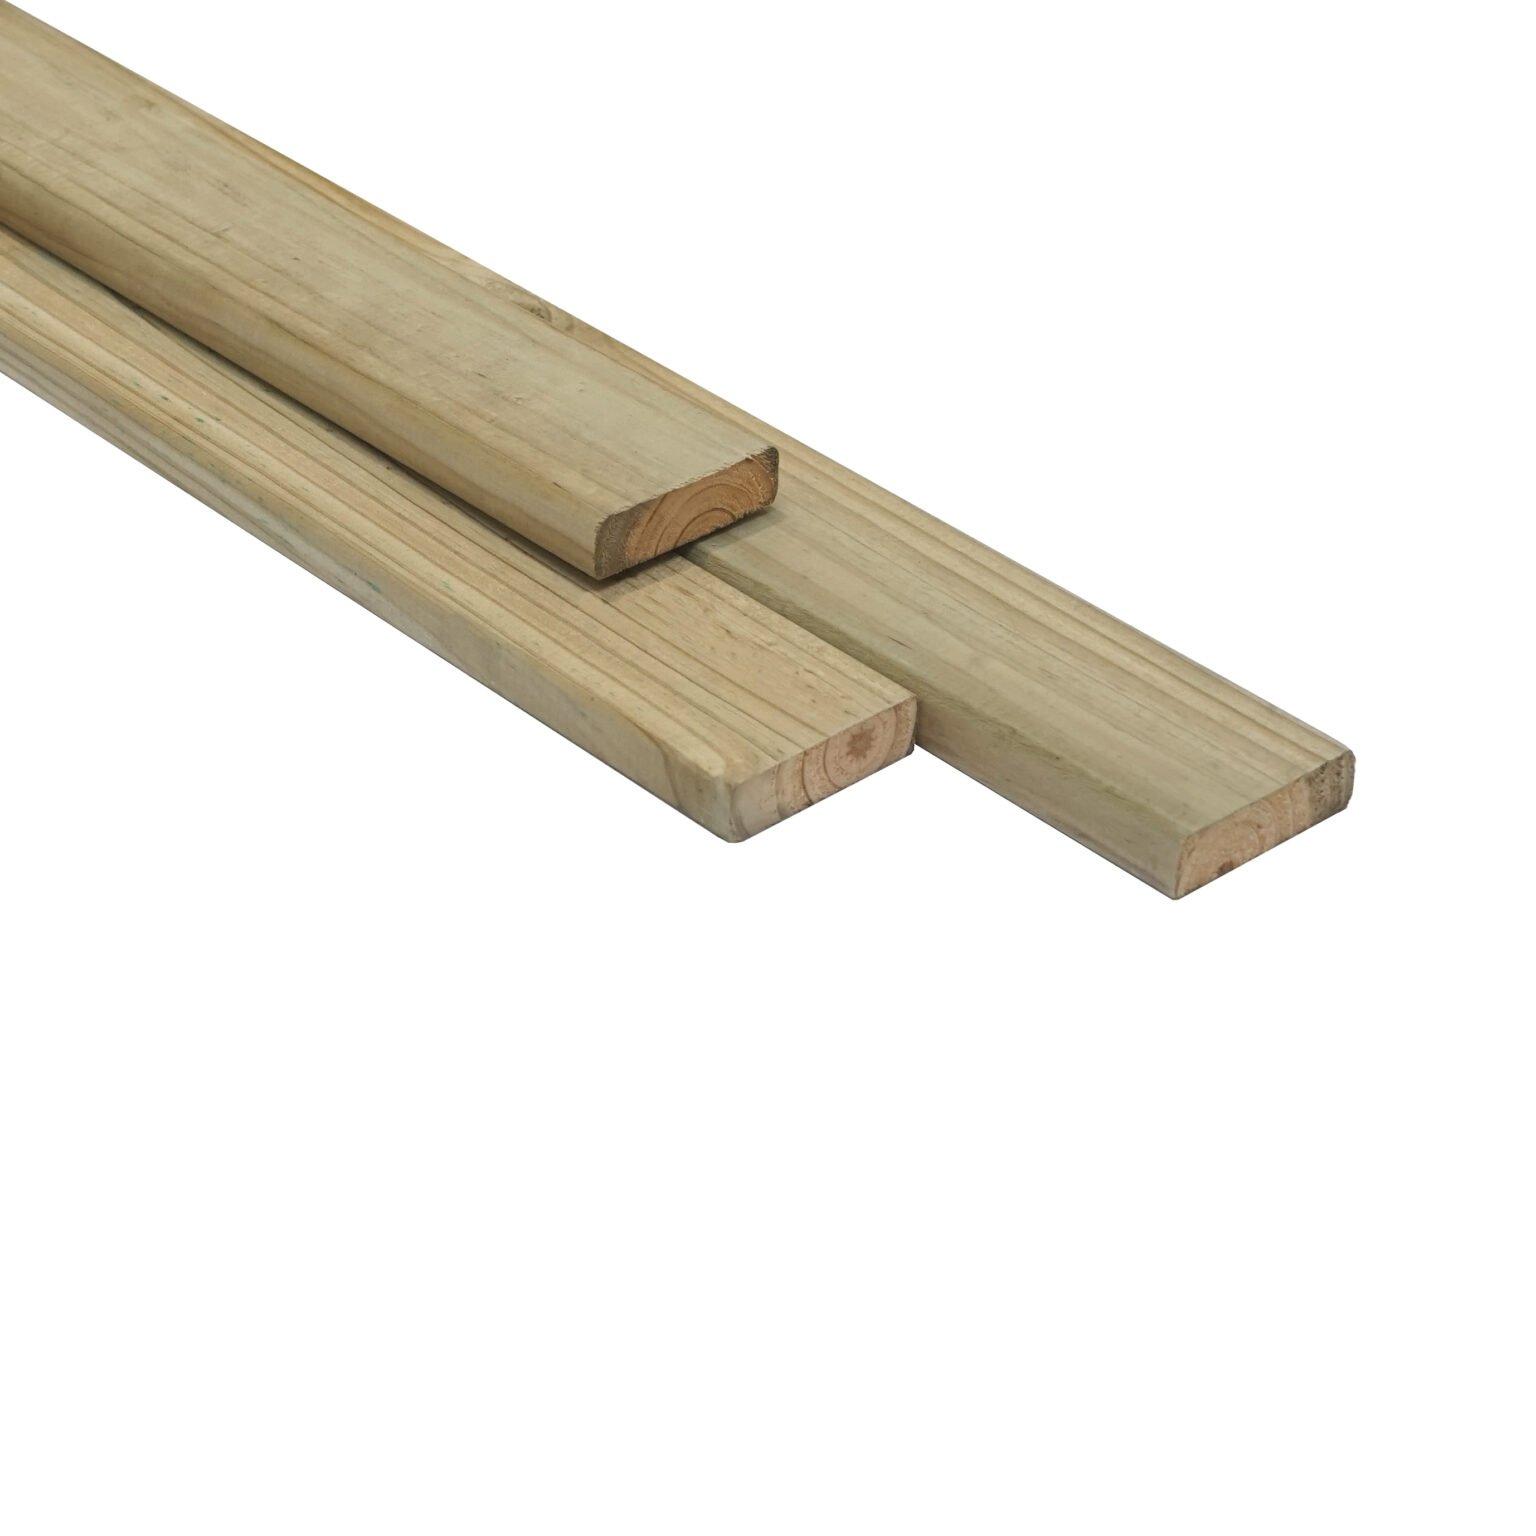 grenenplank-20 x 70 x 1800 mm